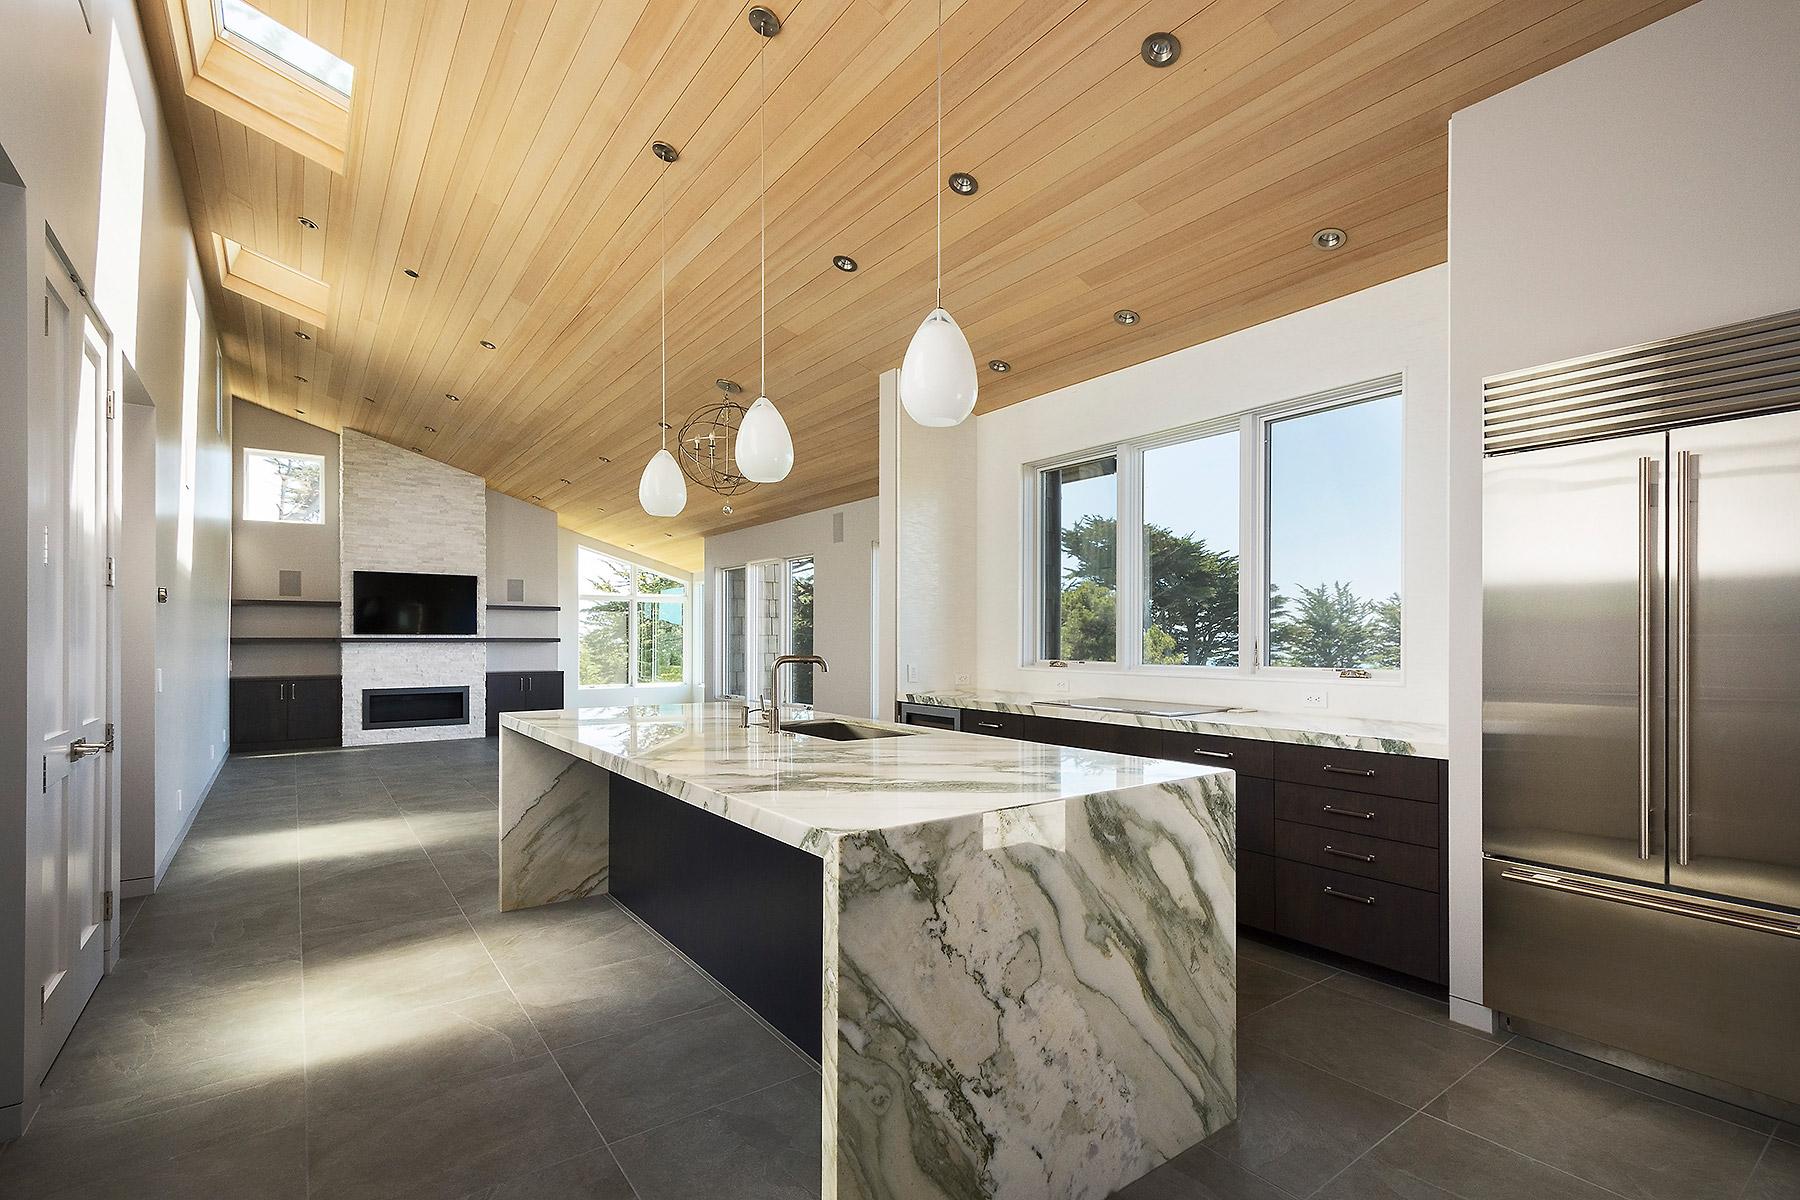 Unfurnished Expansive Kitchen / Dining / Living Area